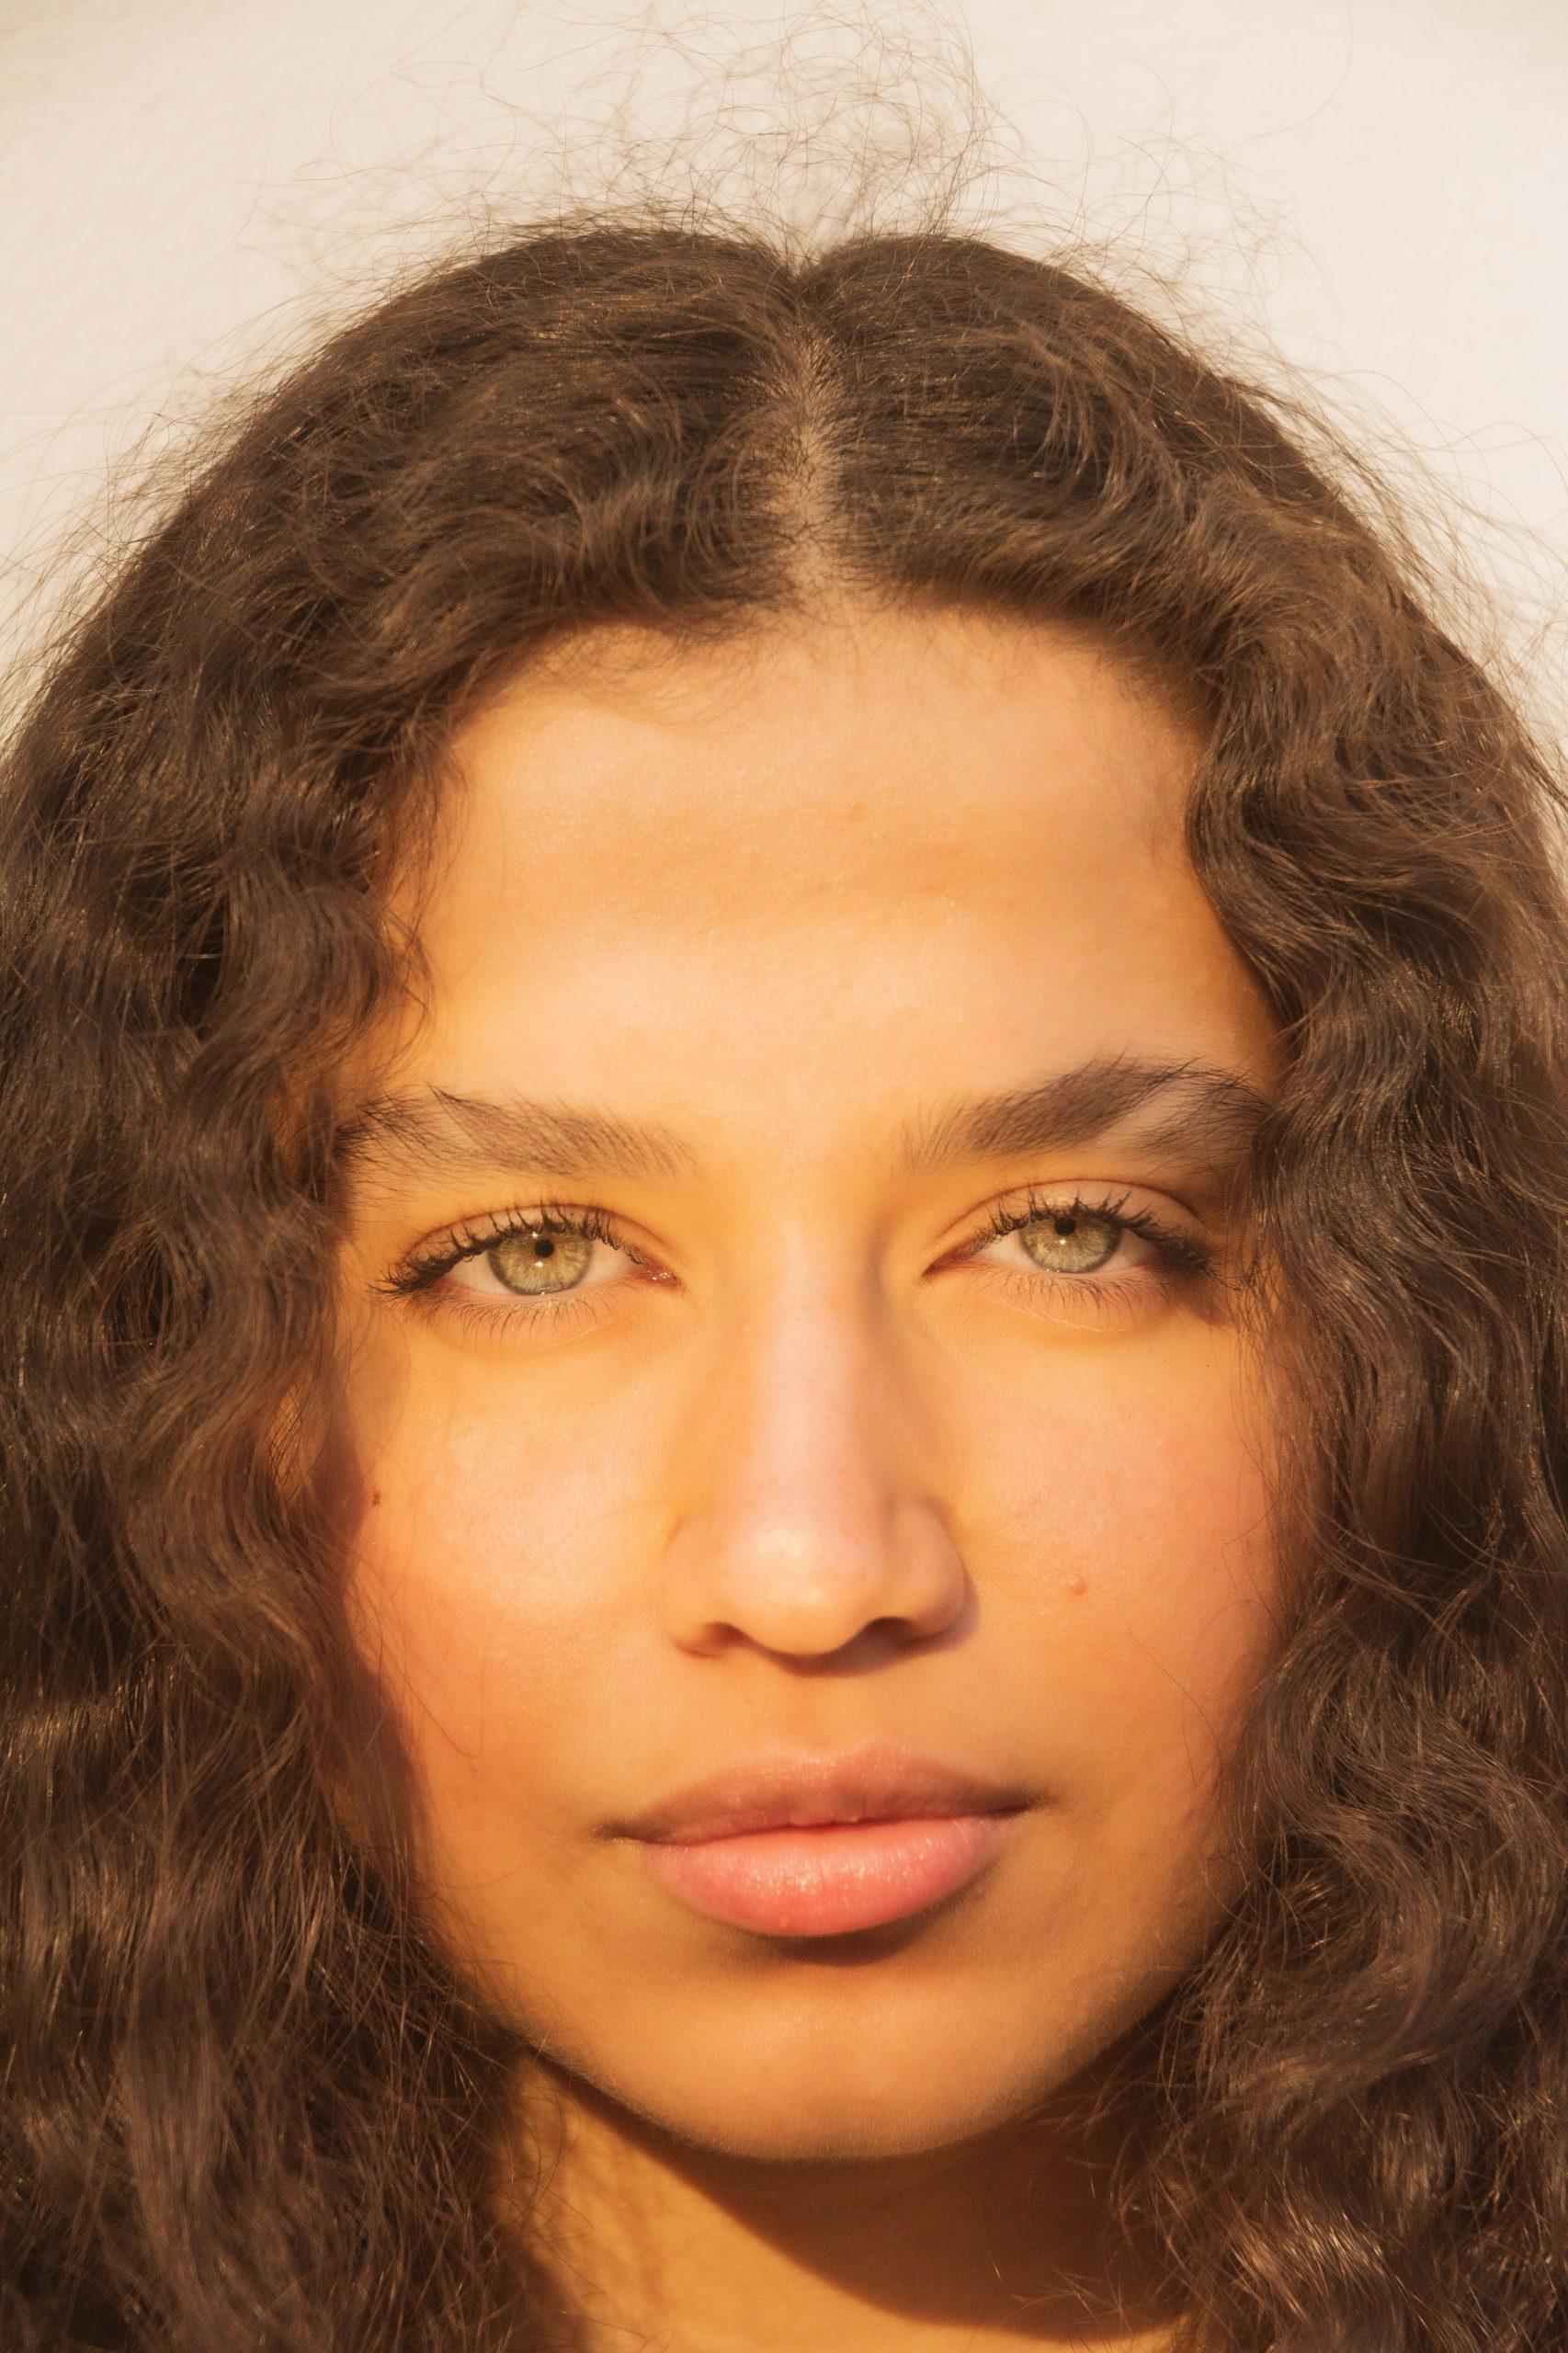 Categorie: Glamour, Portrait - Photographer: ELEONORA PIRAS - Model: NAJWA KAYALI - Location: Milano